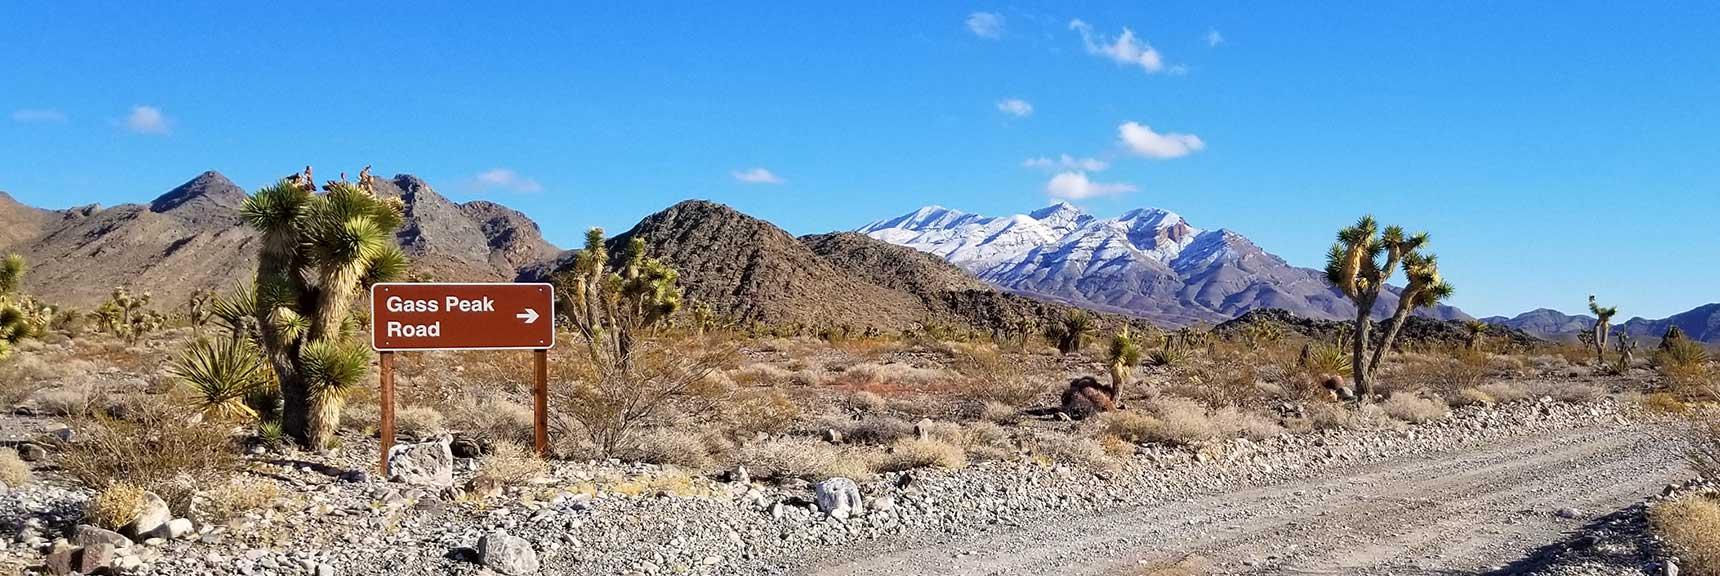 Gass Peak Viewed from Mormon Well Rd, Desert National Wildlife Refuge, Nevada